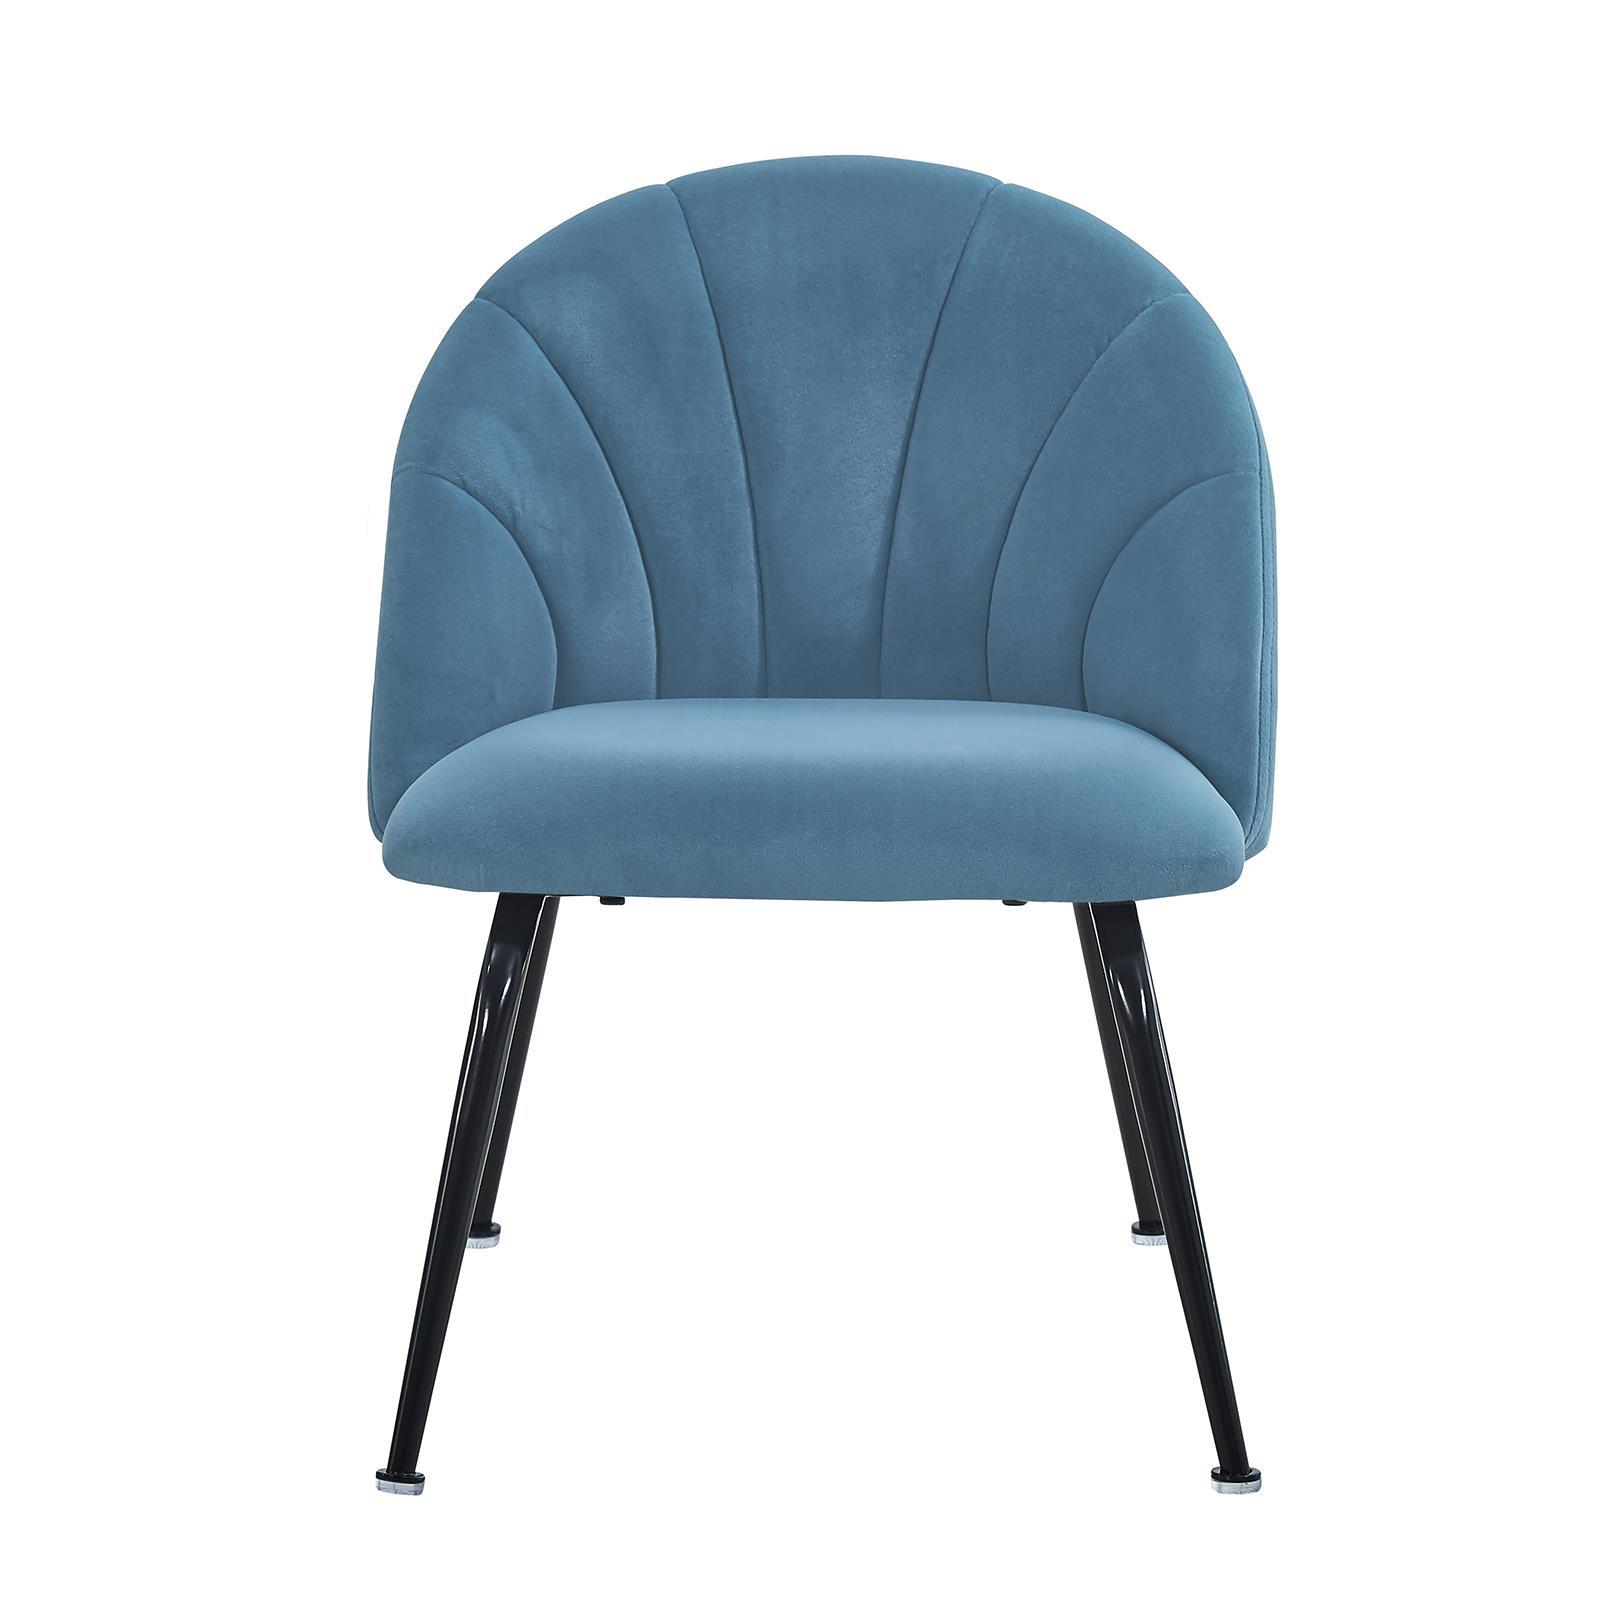 Kids Velvet Oyster Chair Accent Armchair Bedroom Living Room Lounge Furniture